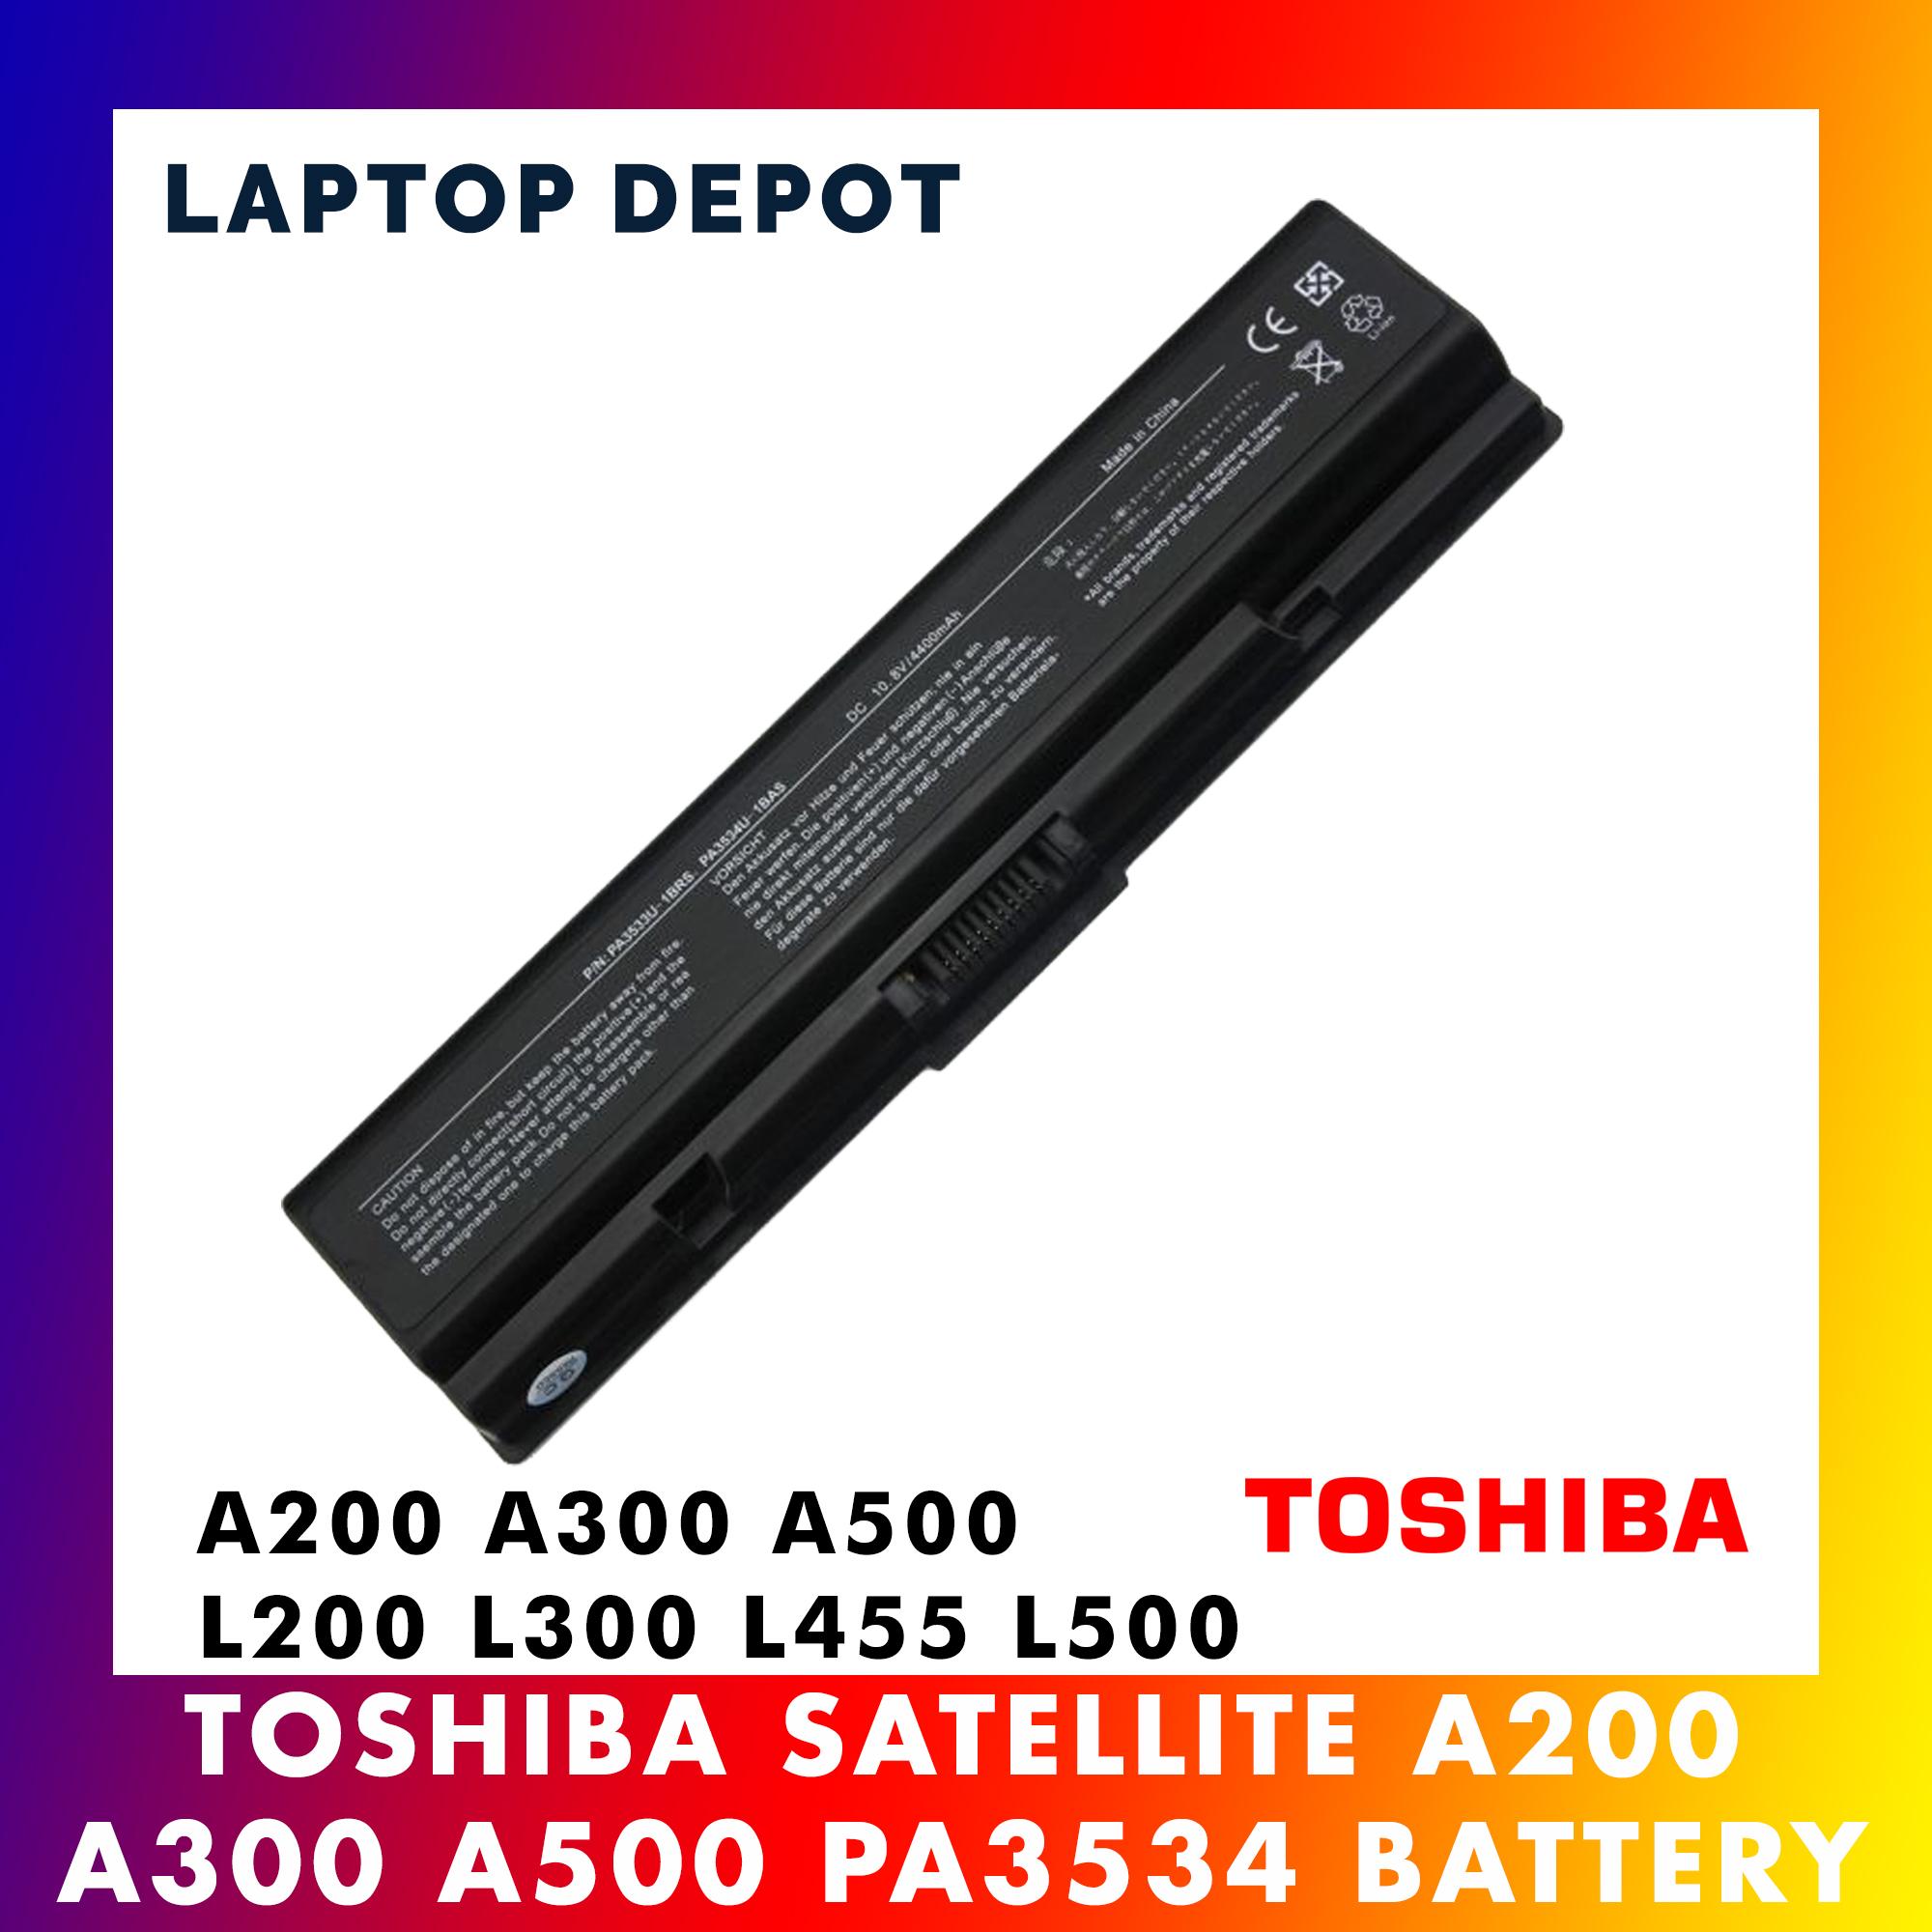 Toshiba Satellite A200 A300 A500 L200 L305 L505 L555 L350 L450 Battery